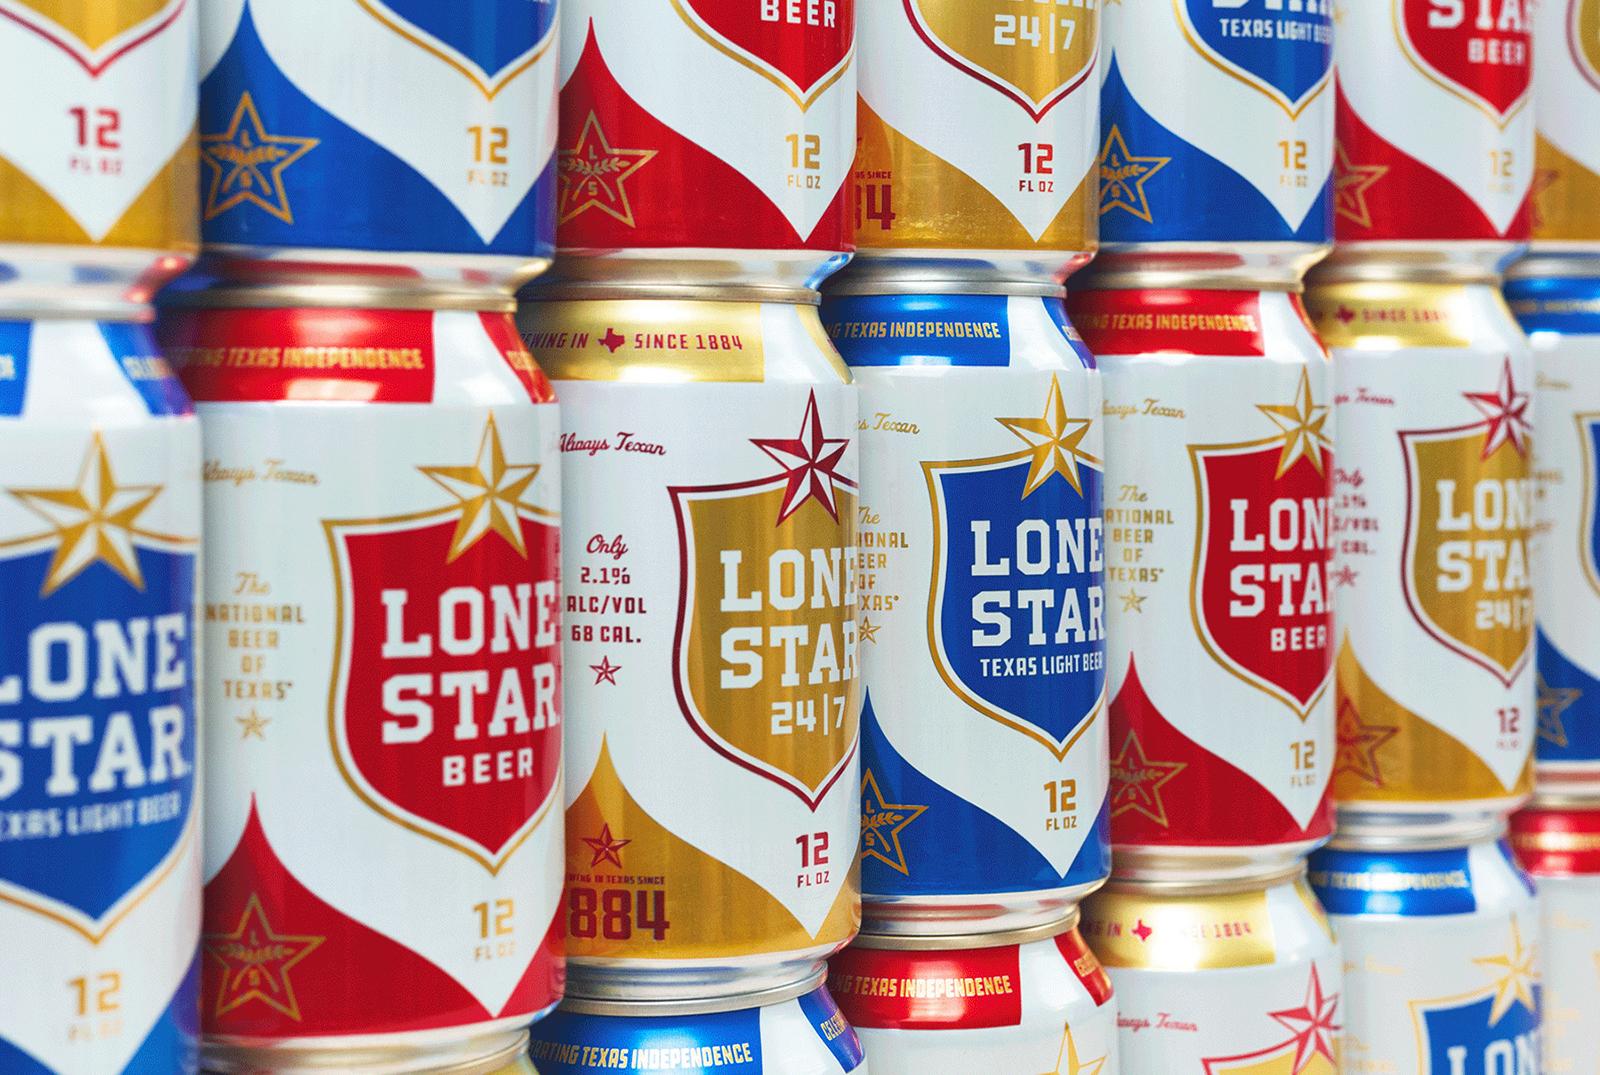 Lone Star孤星啤酒品牌更新全新的品牌VI视觉和包装设计-深圳VI设计16